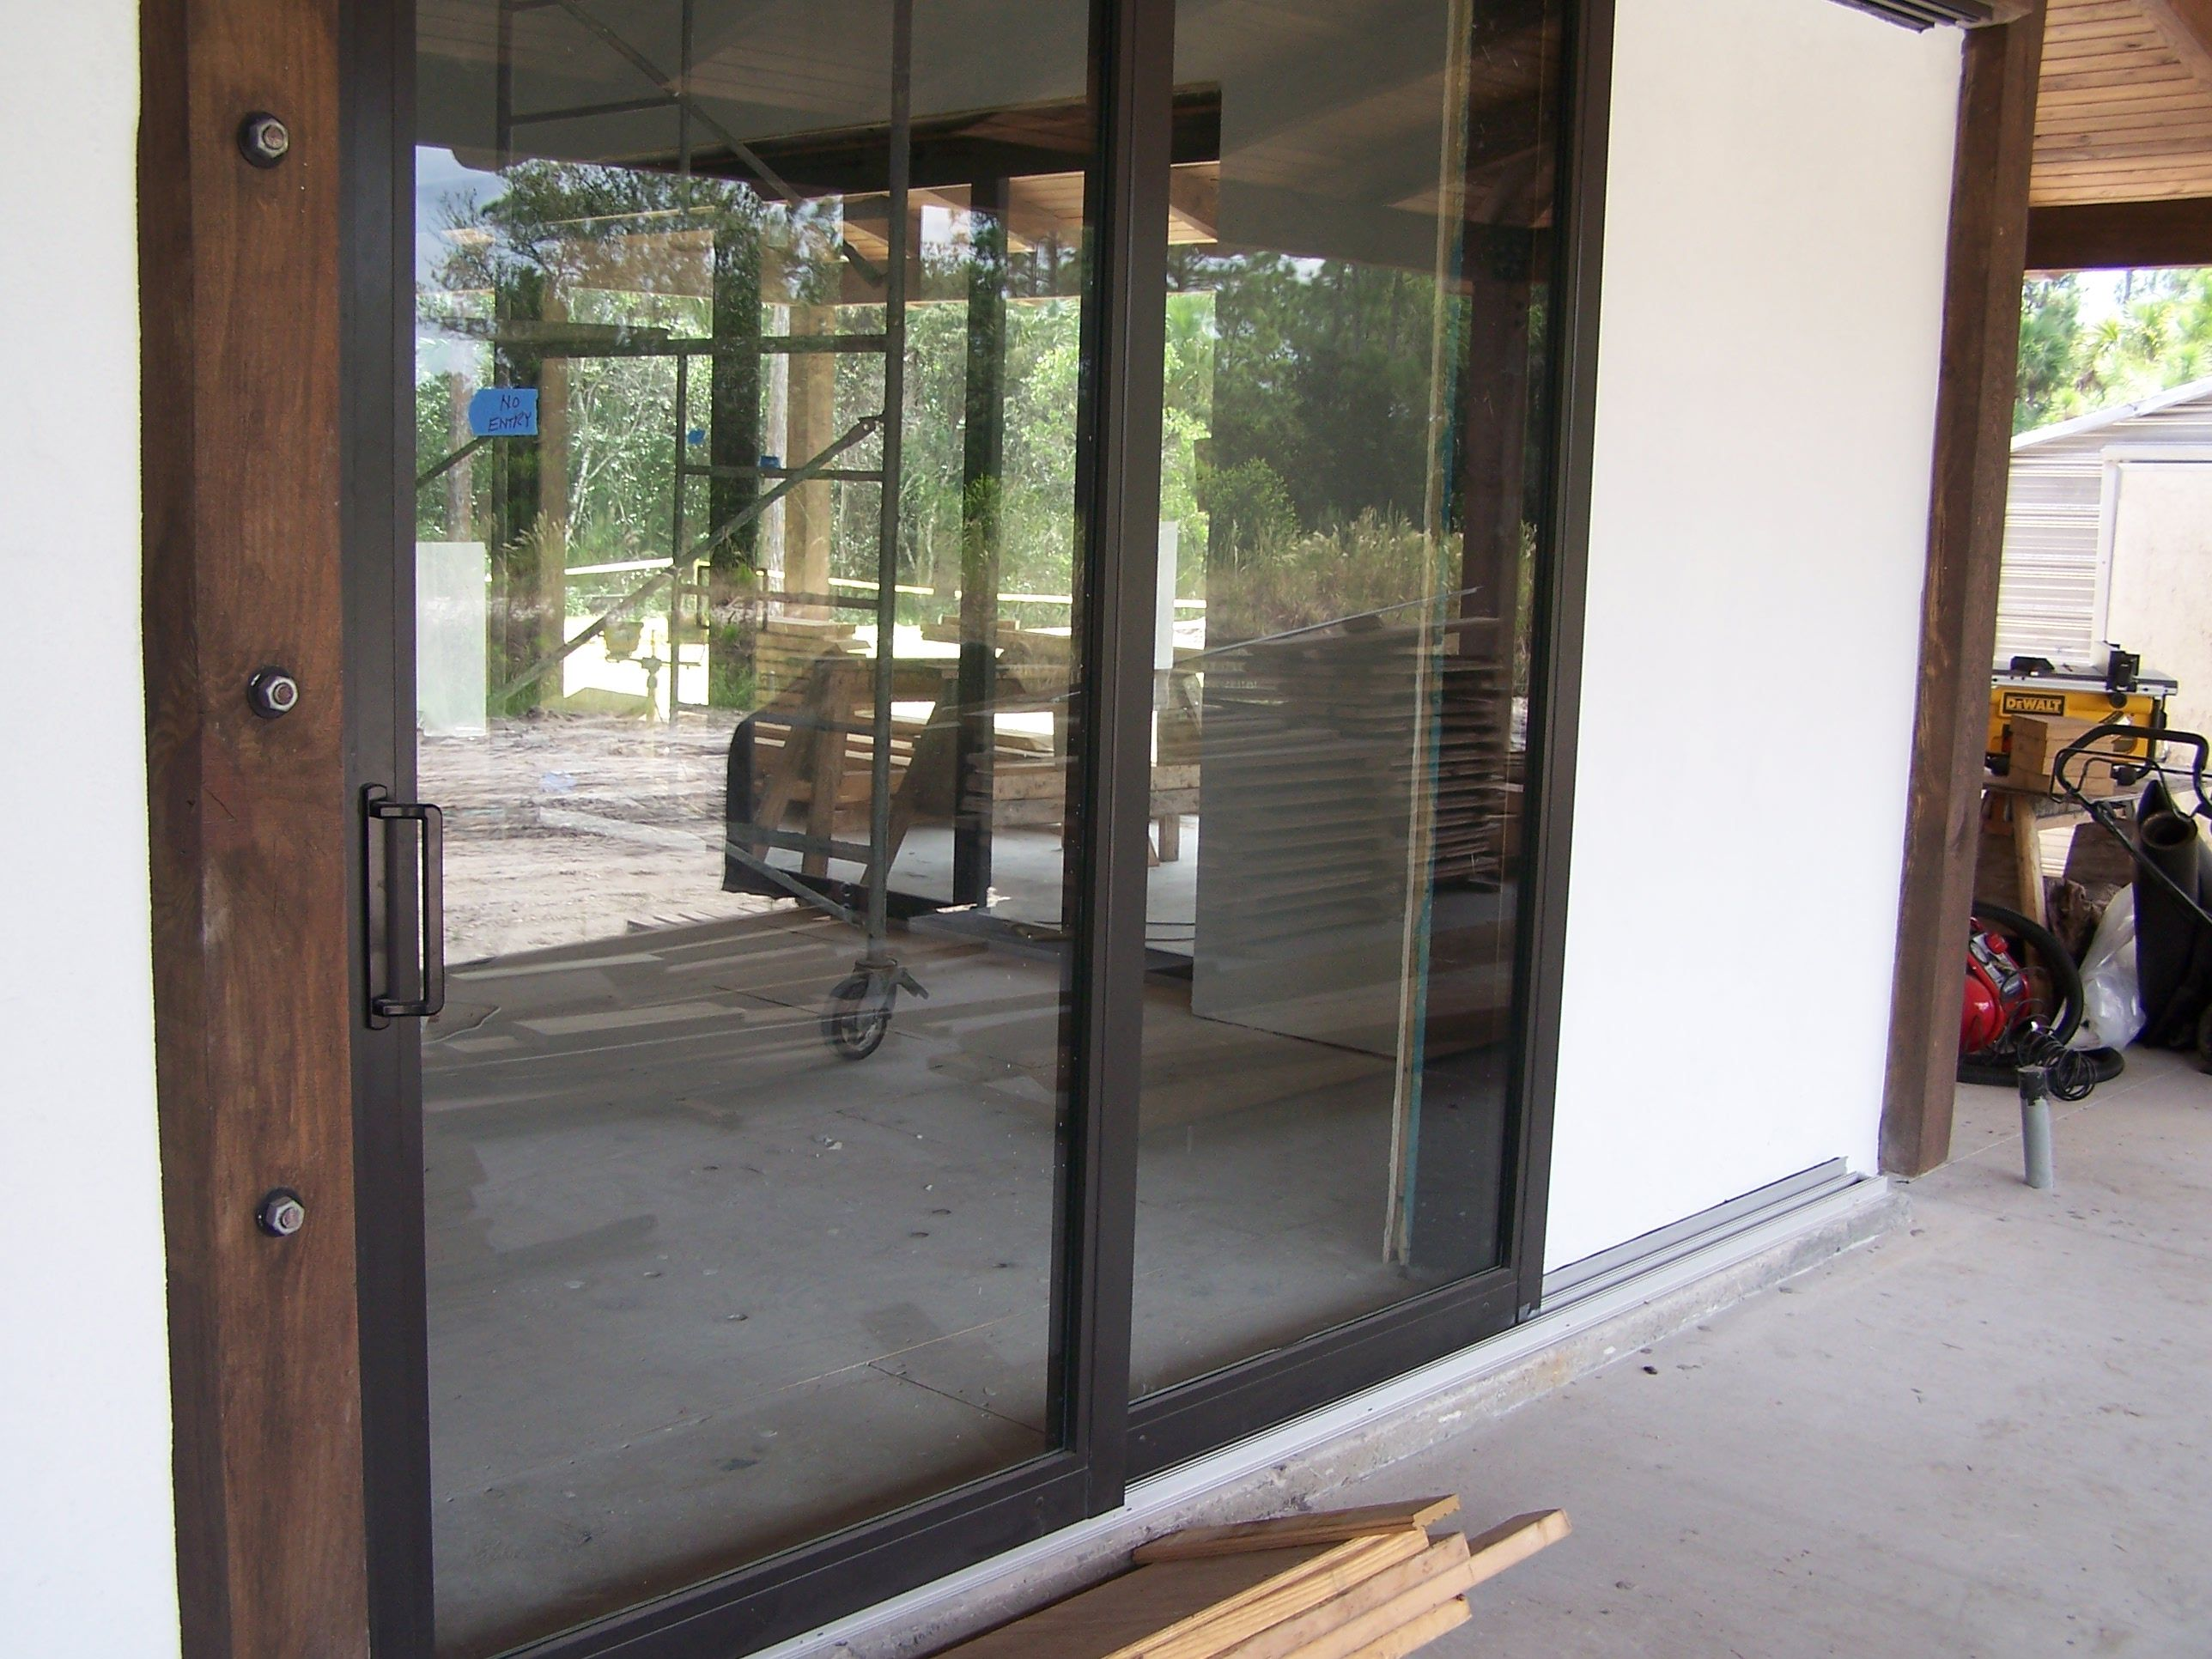 Pgt 770 sliding glass doors window photos pinterest for 10 ft sliding glass door